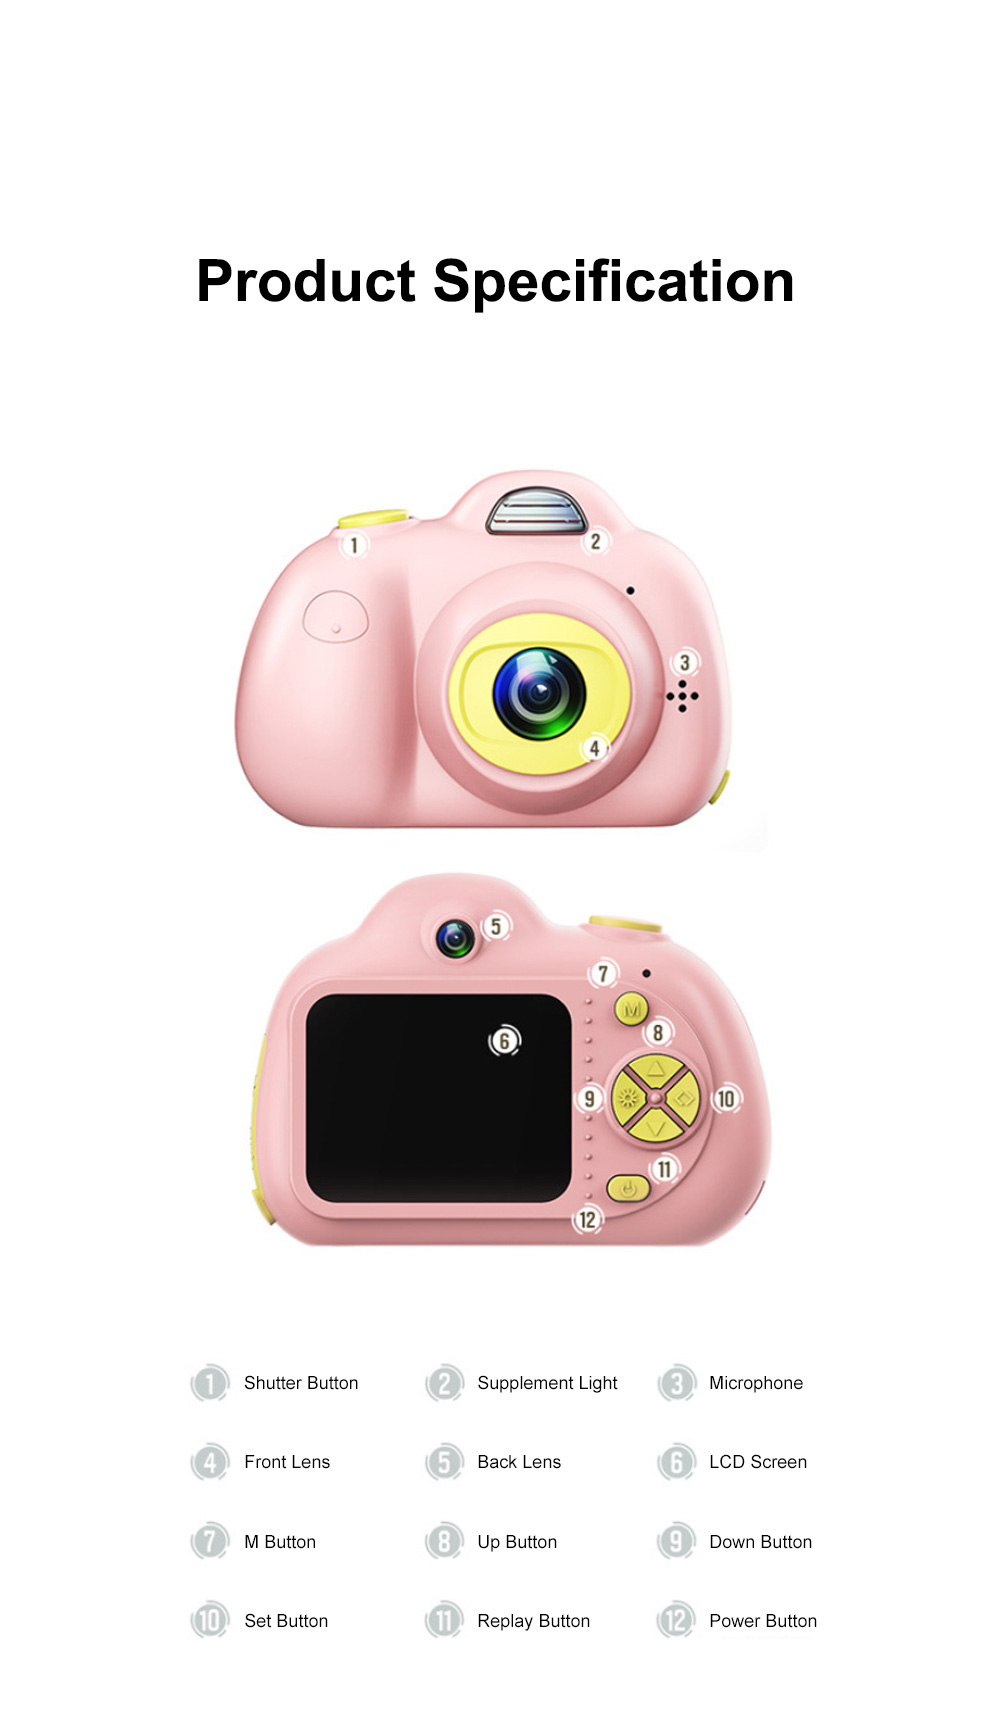 Children Digital Single Lens Reflex Creative Gift Household Use Broken-resistant Twin Lens Toy Camera Mini Funny Kids Digital Camera 10